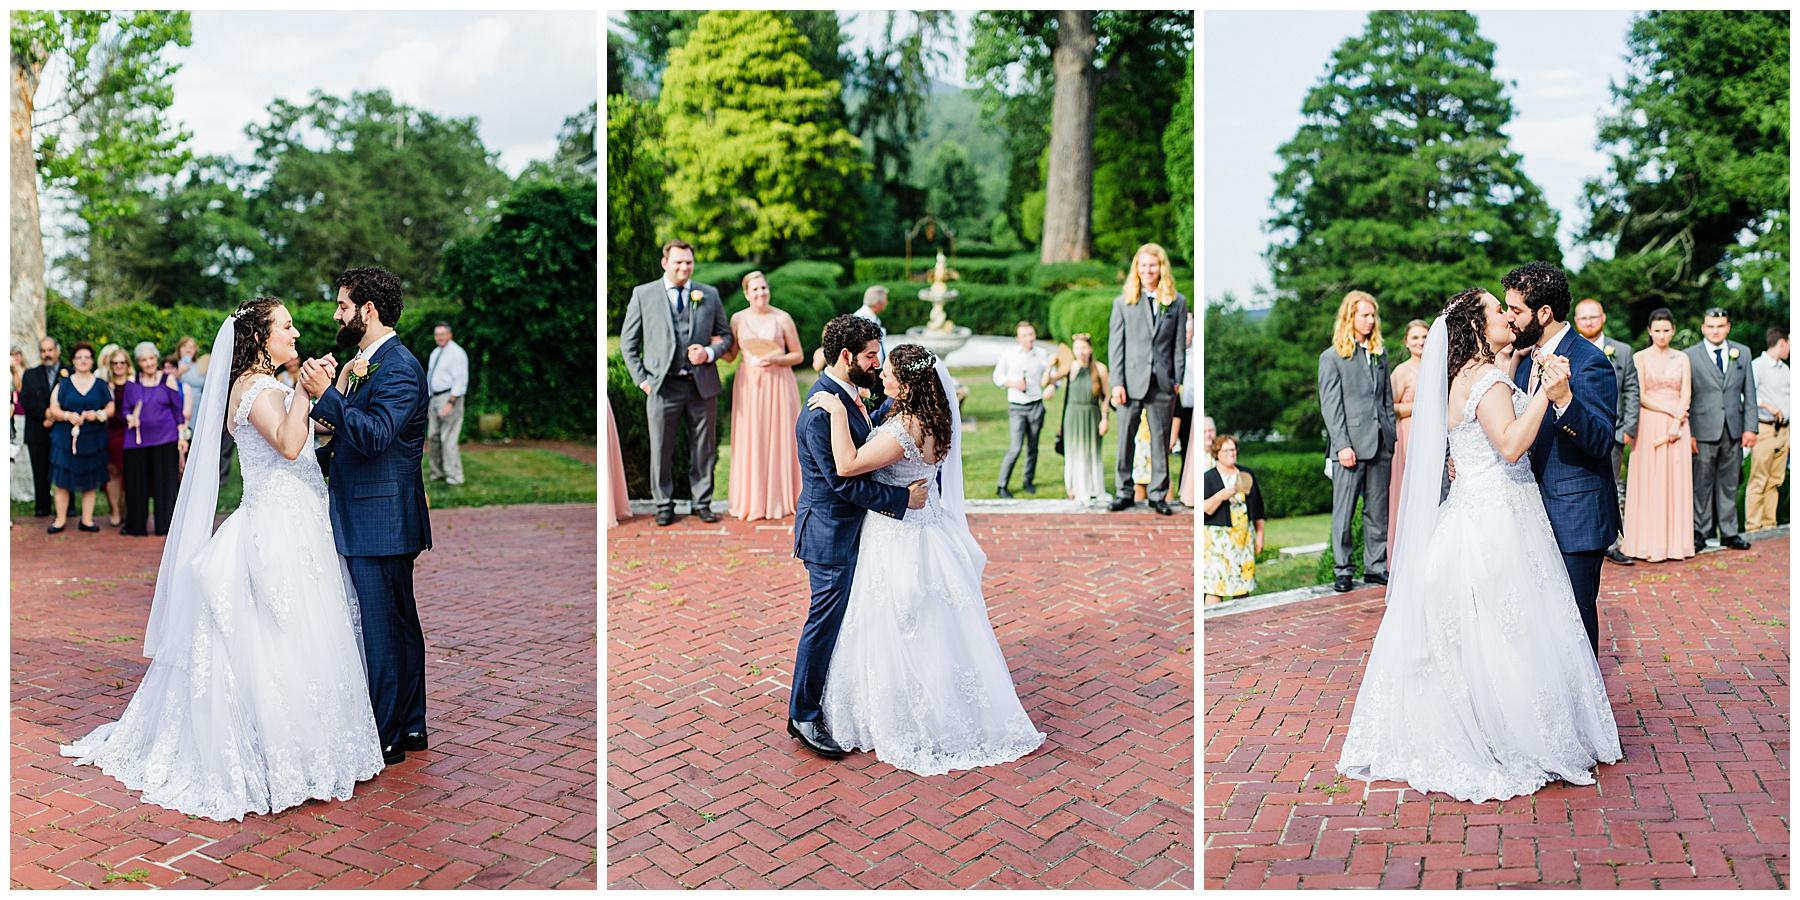 oak-ridge-estate-wedding-virginia-photographer41.jpg